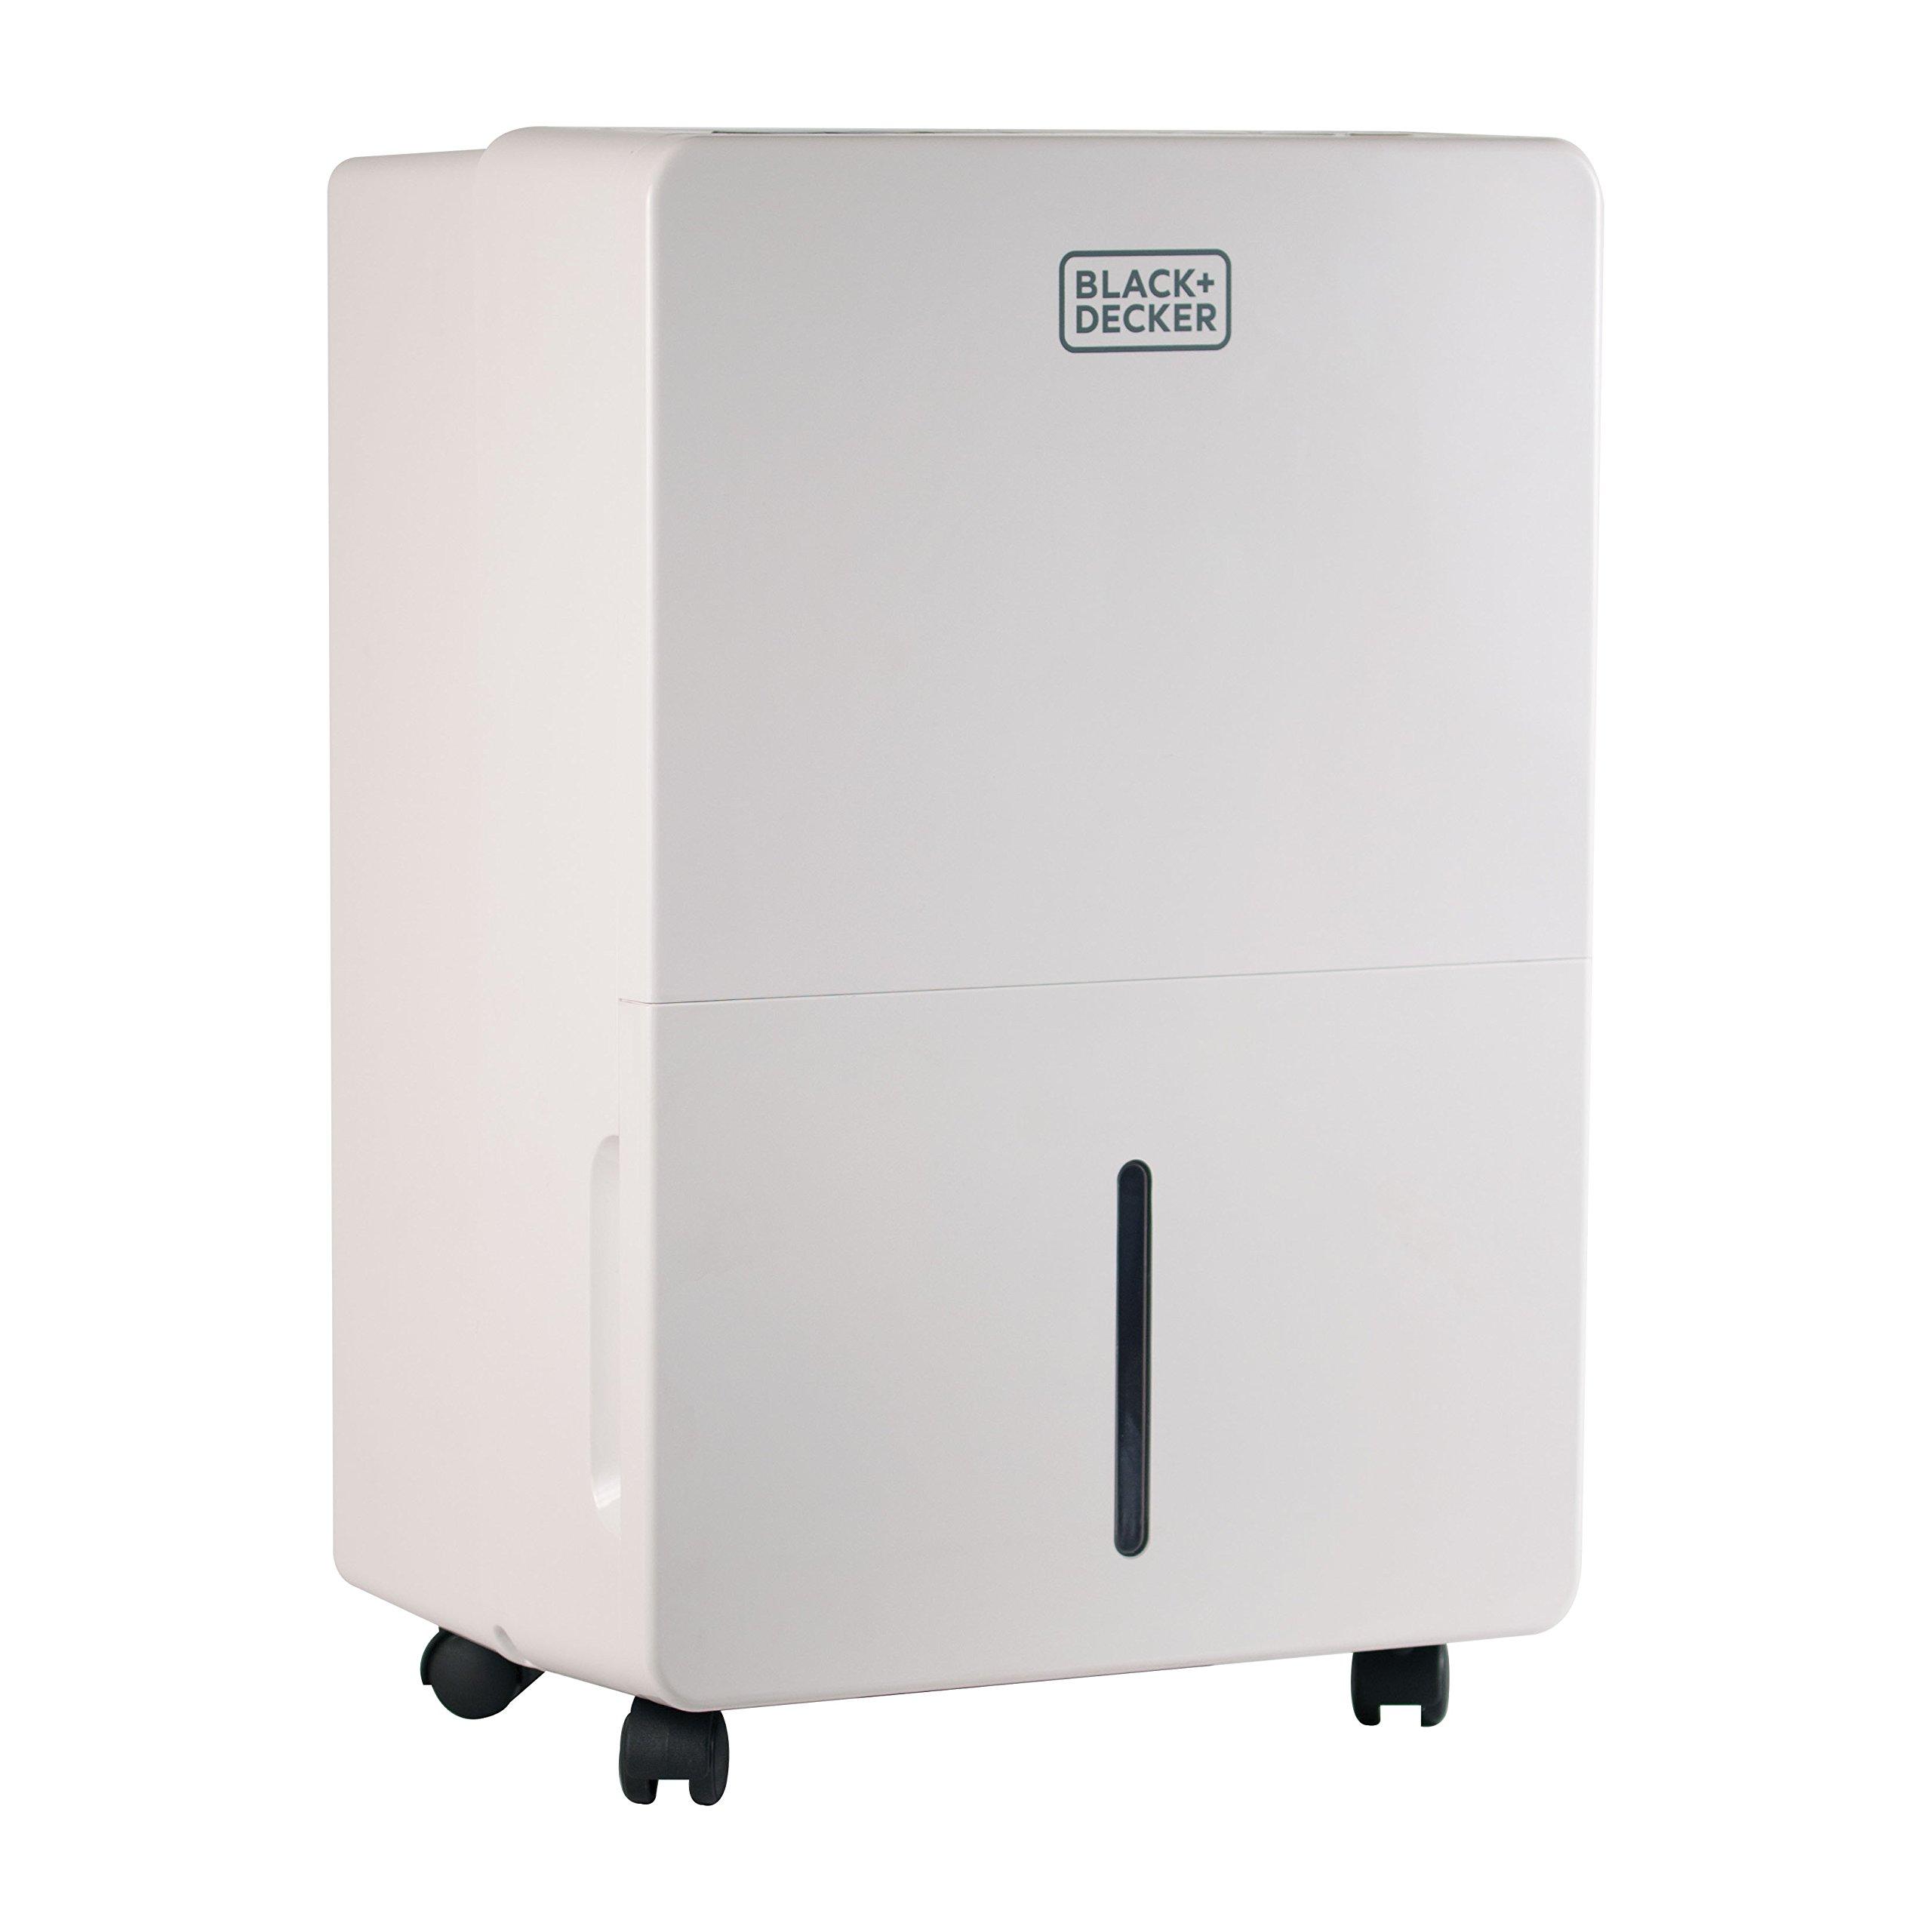 BLACK+DECKER BDT50WT 50 Pint Energy Star Portable Dehumidifier by BLACK+DECKER